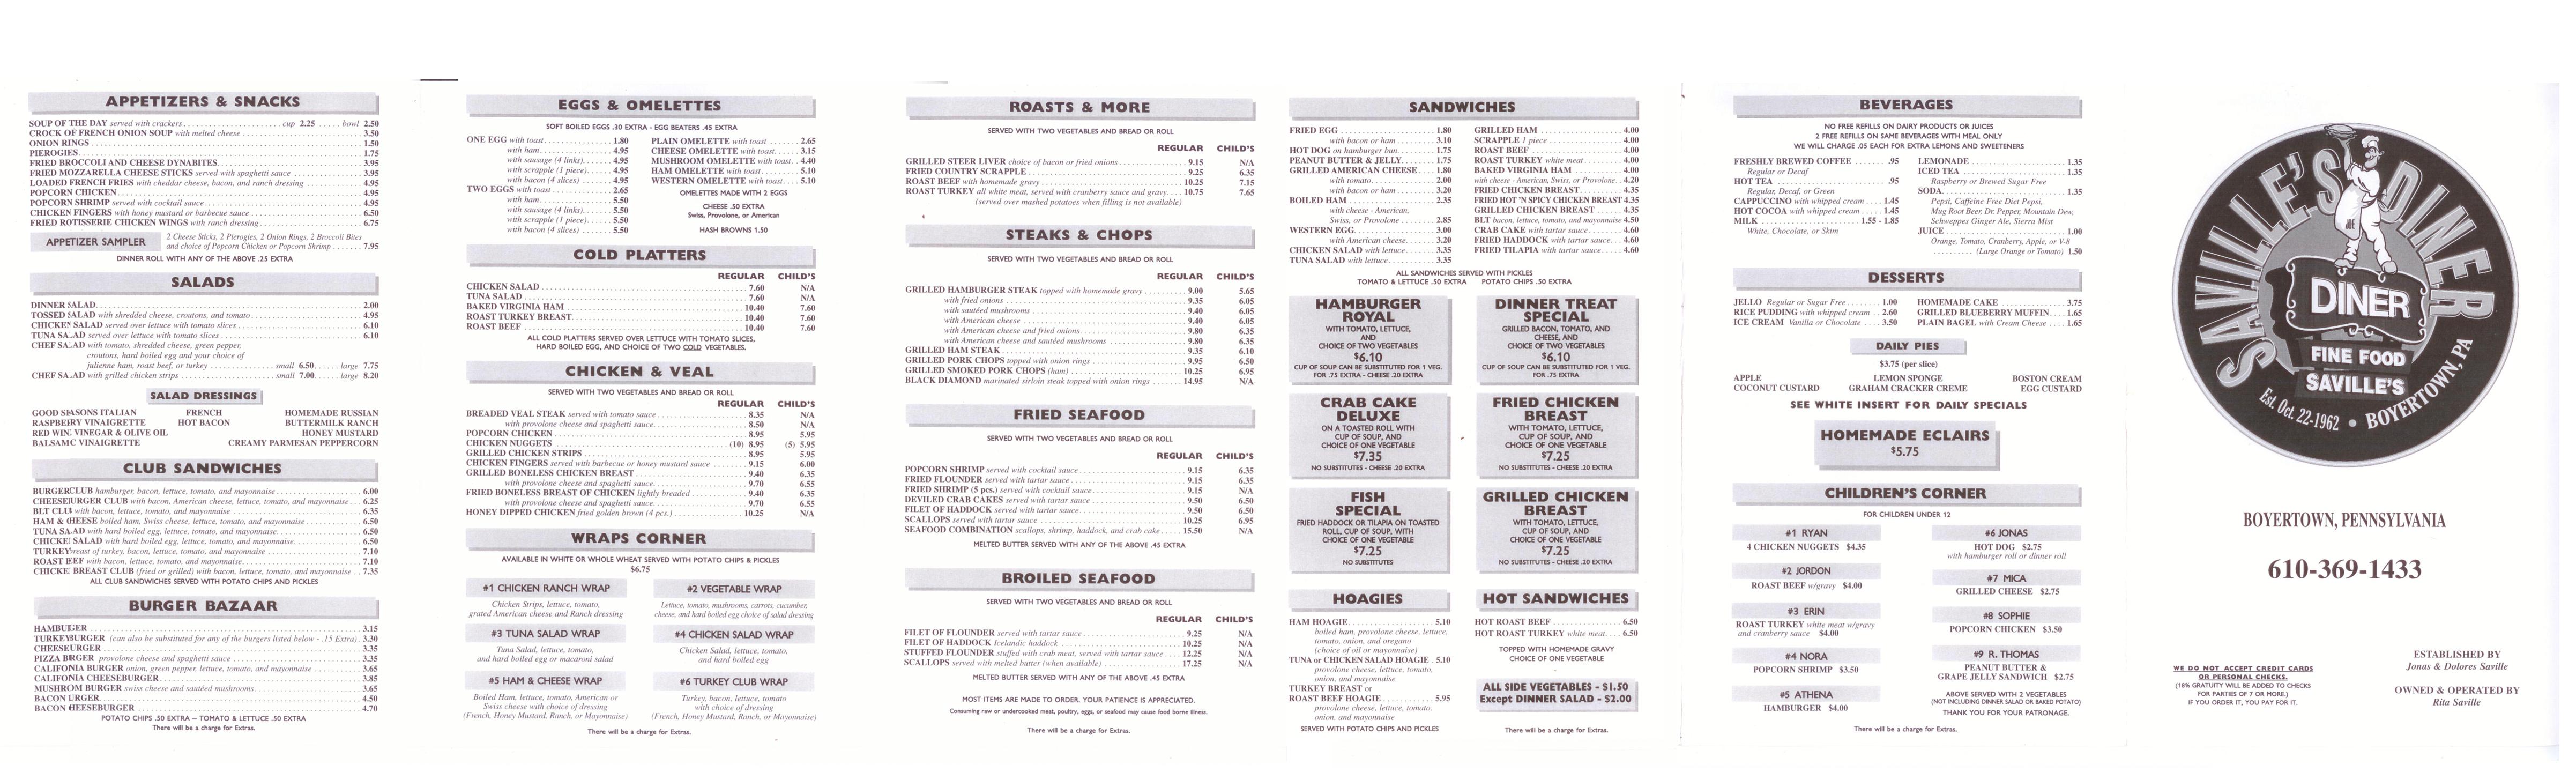 Saville's Diner Menu